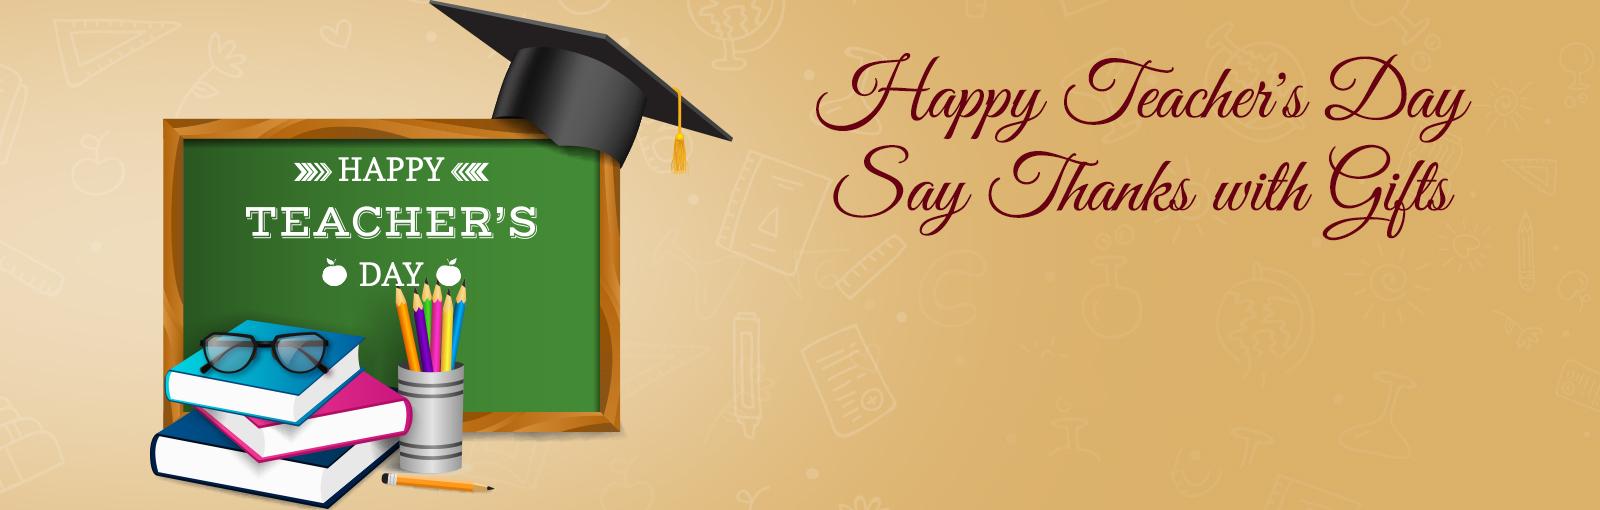 Celebrate Teacher's Day